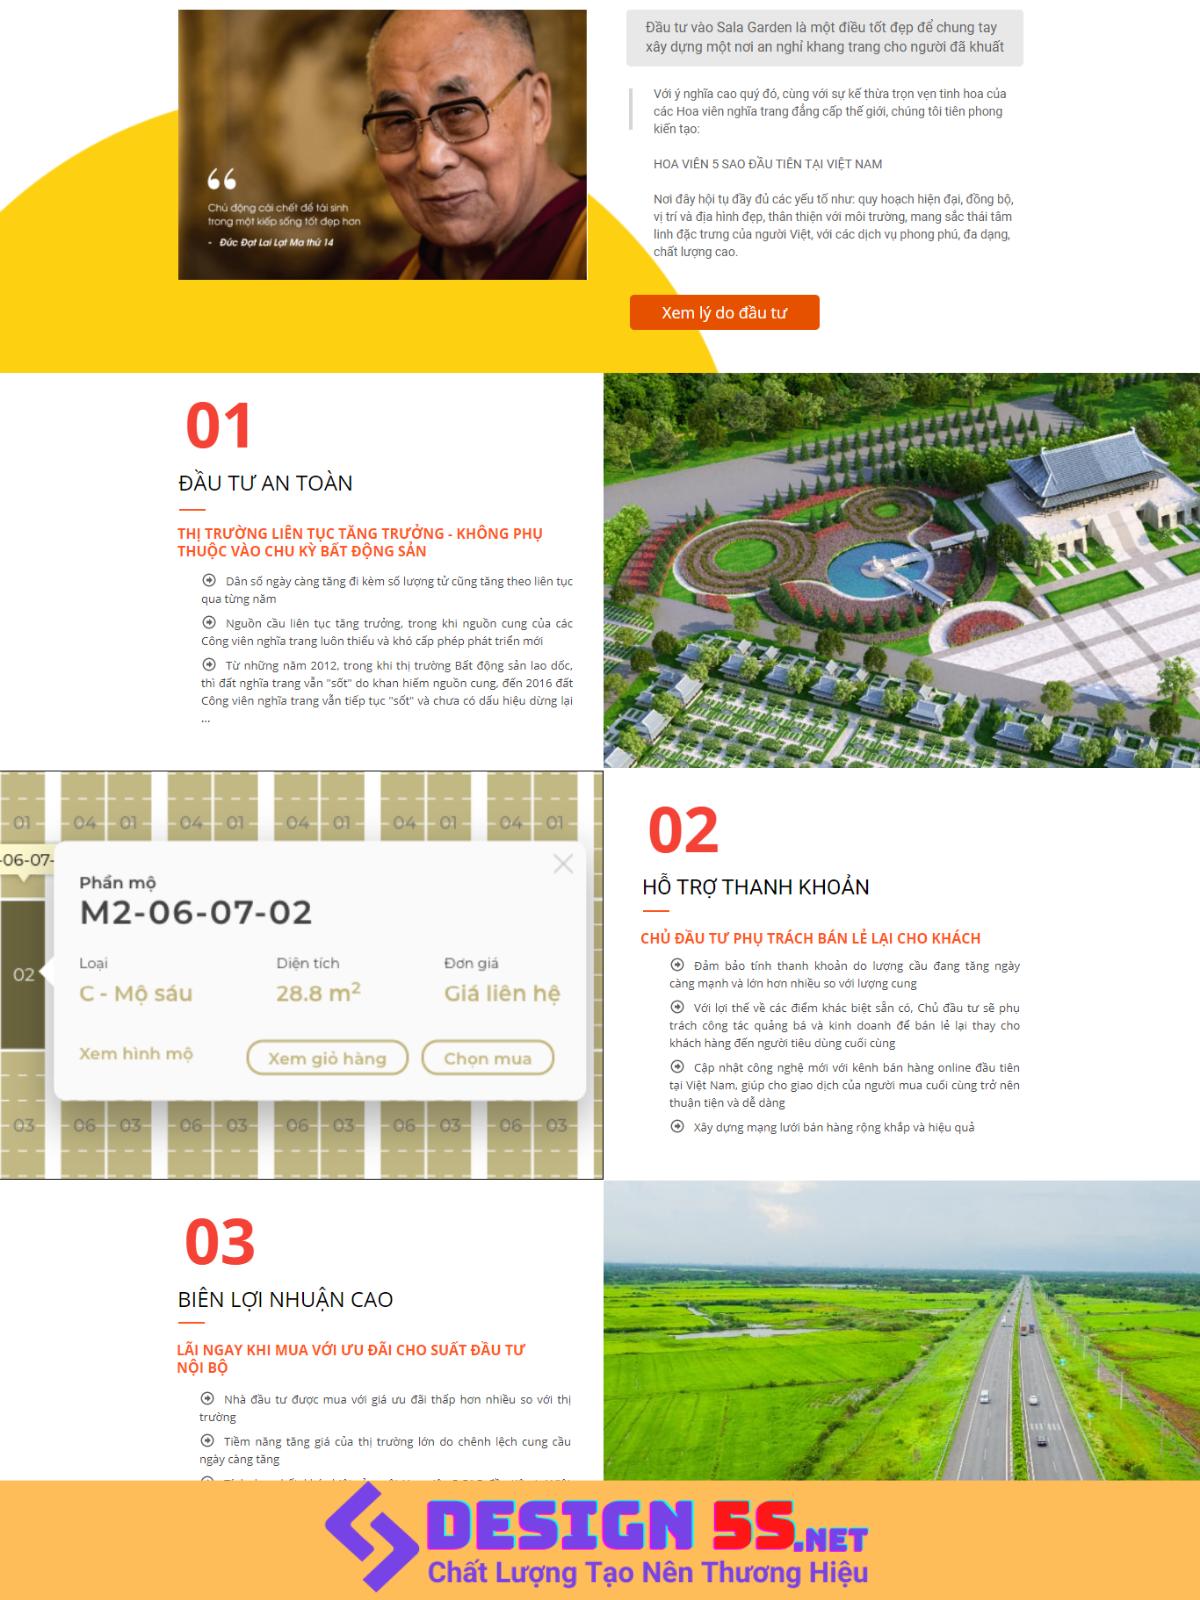 Theme blogspot bất động sản landing Sala Garden VSM79 - Ảnh 2